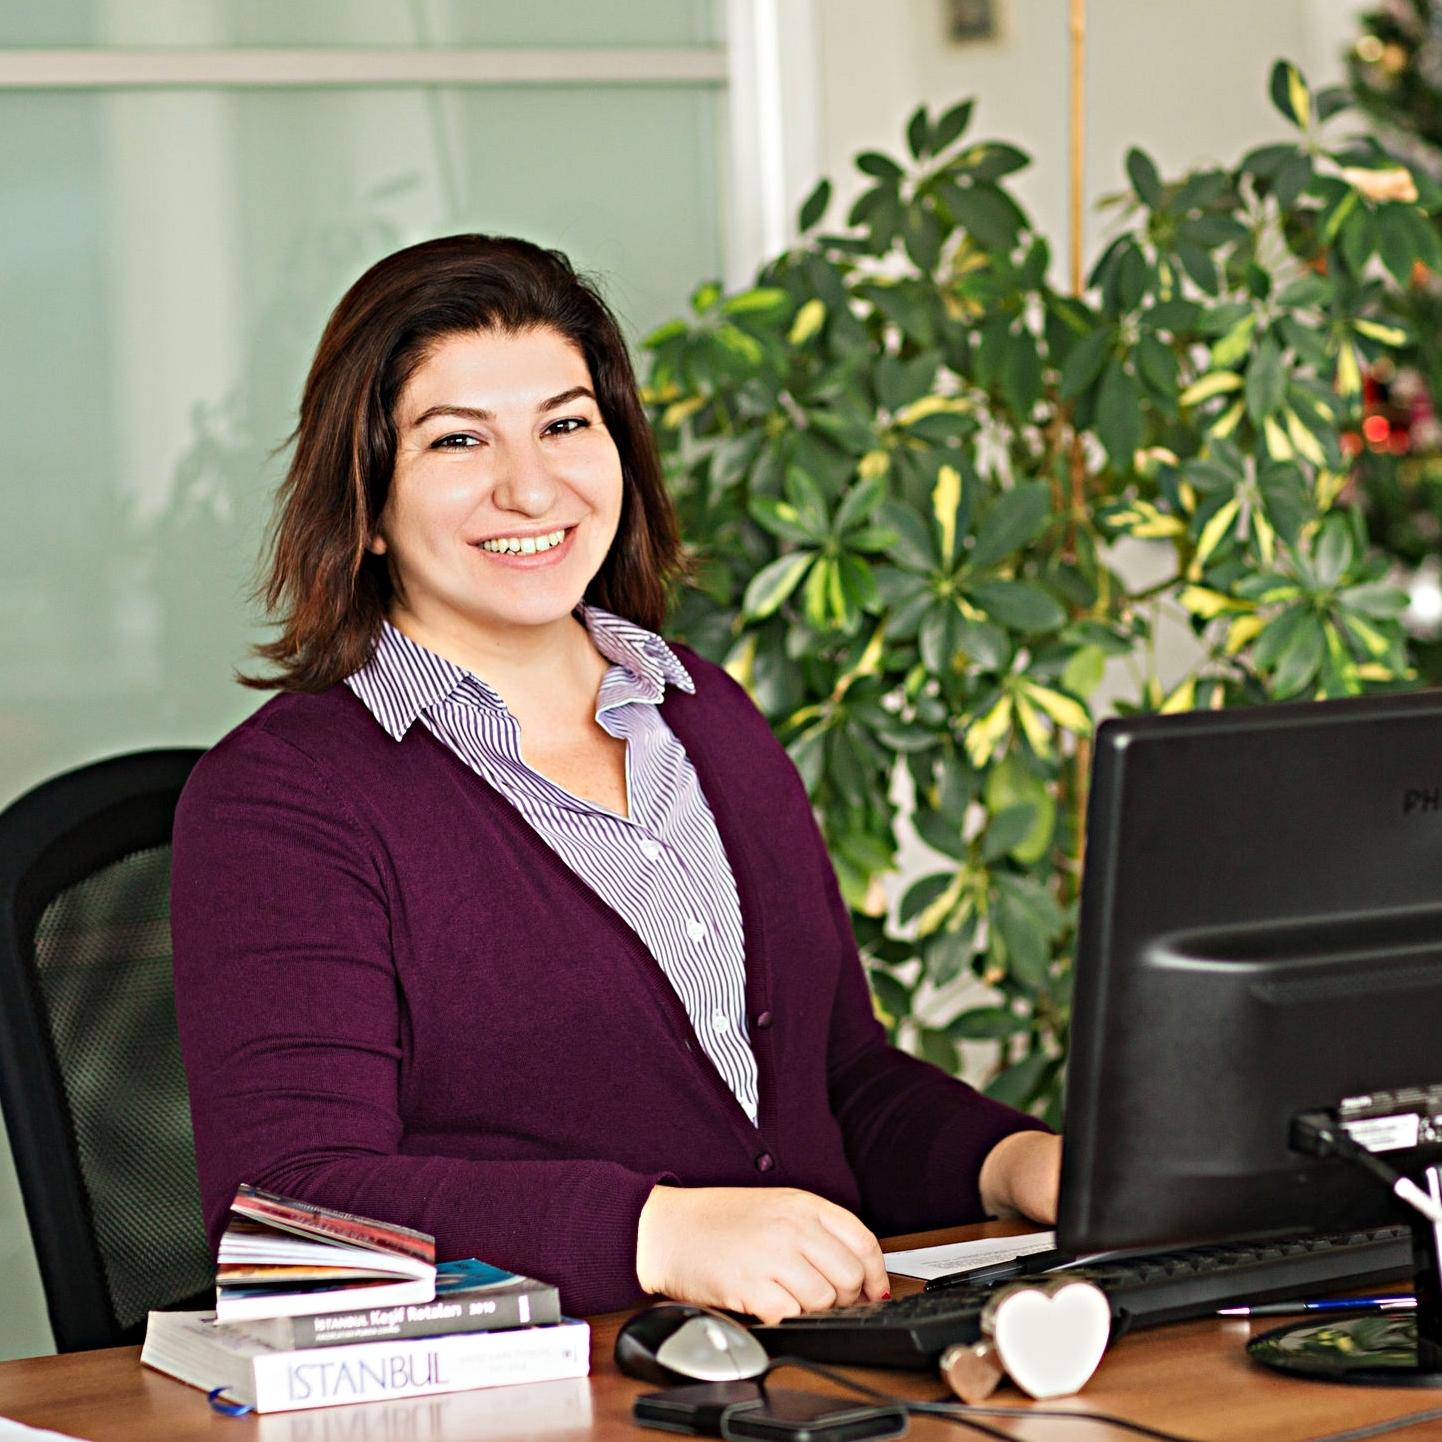 ECE ÇİFTÇİOĞLU - Senior Producer